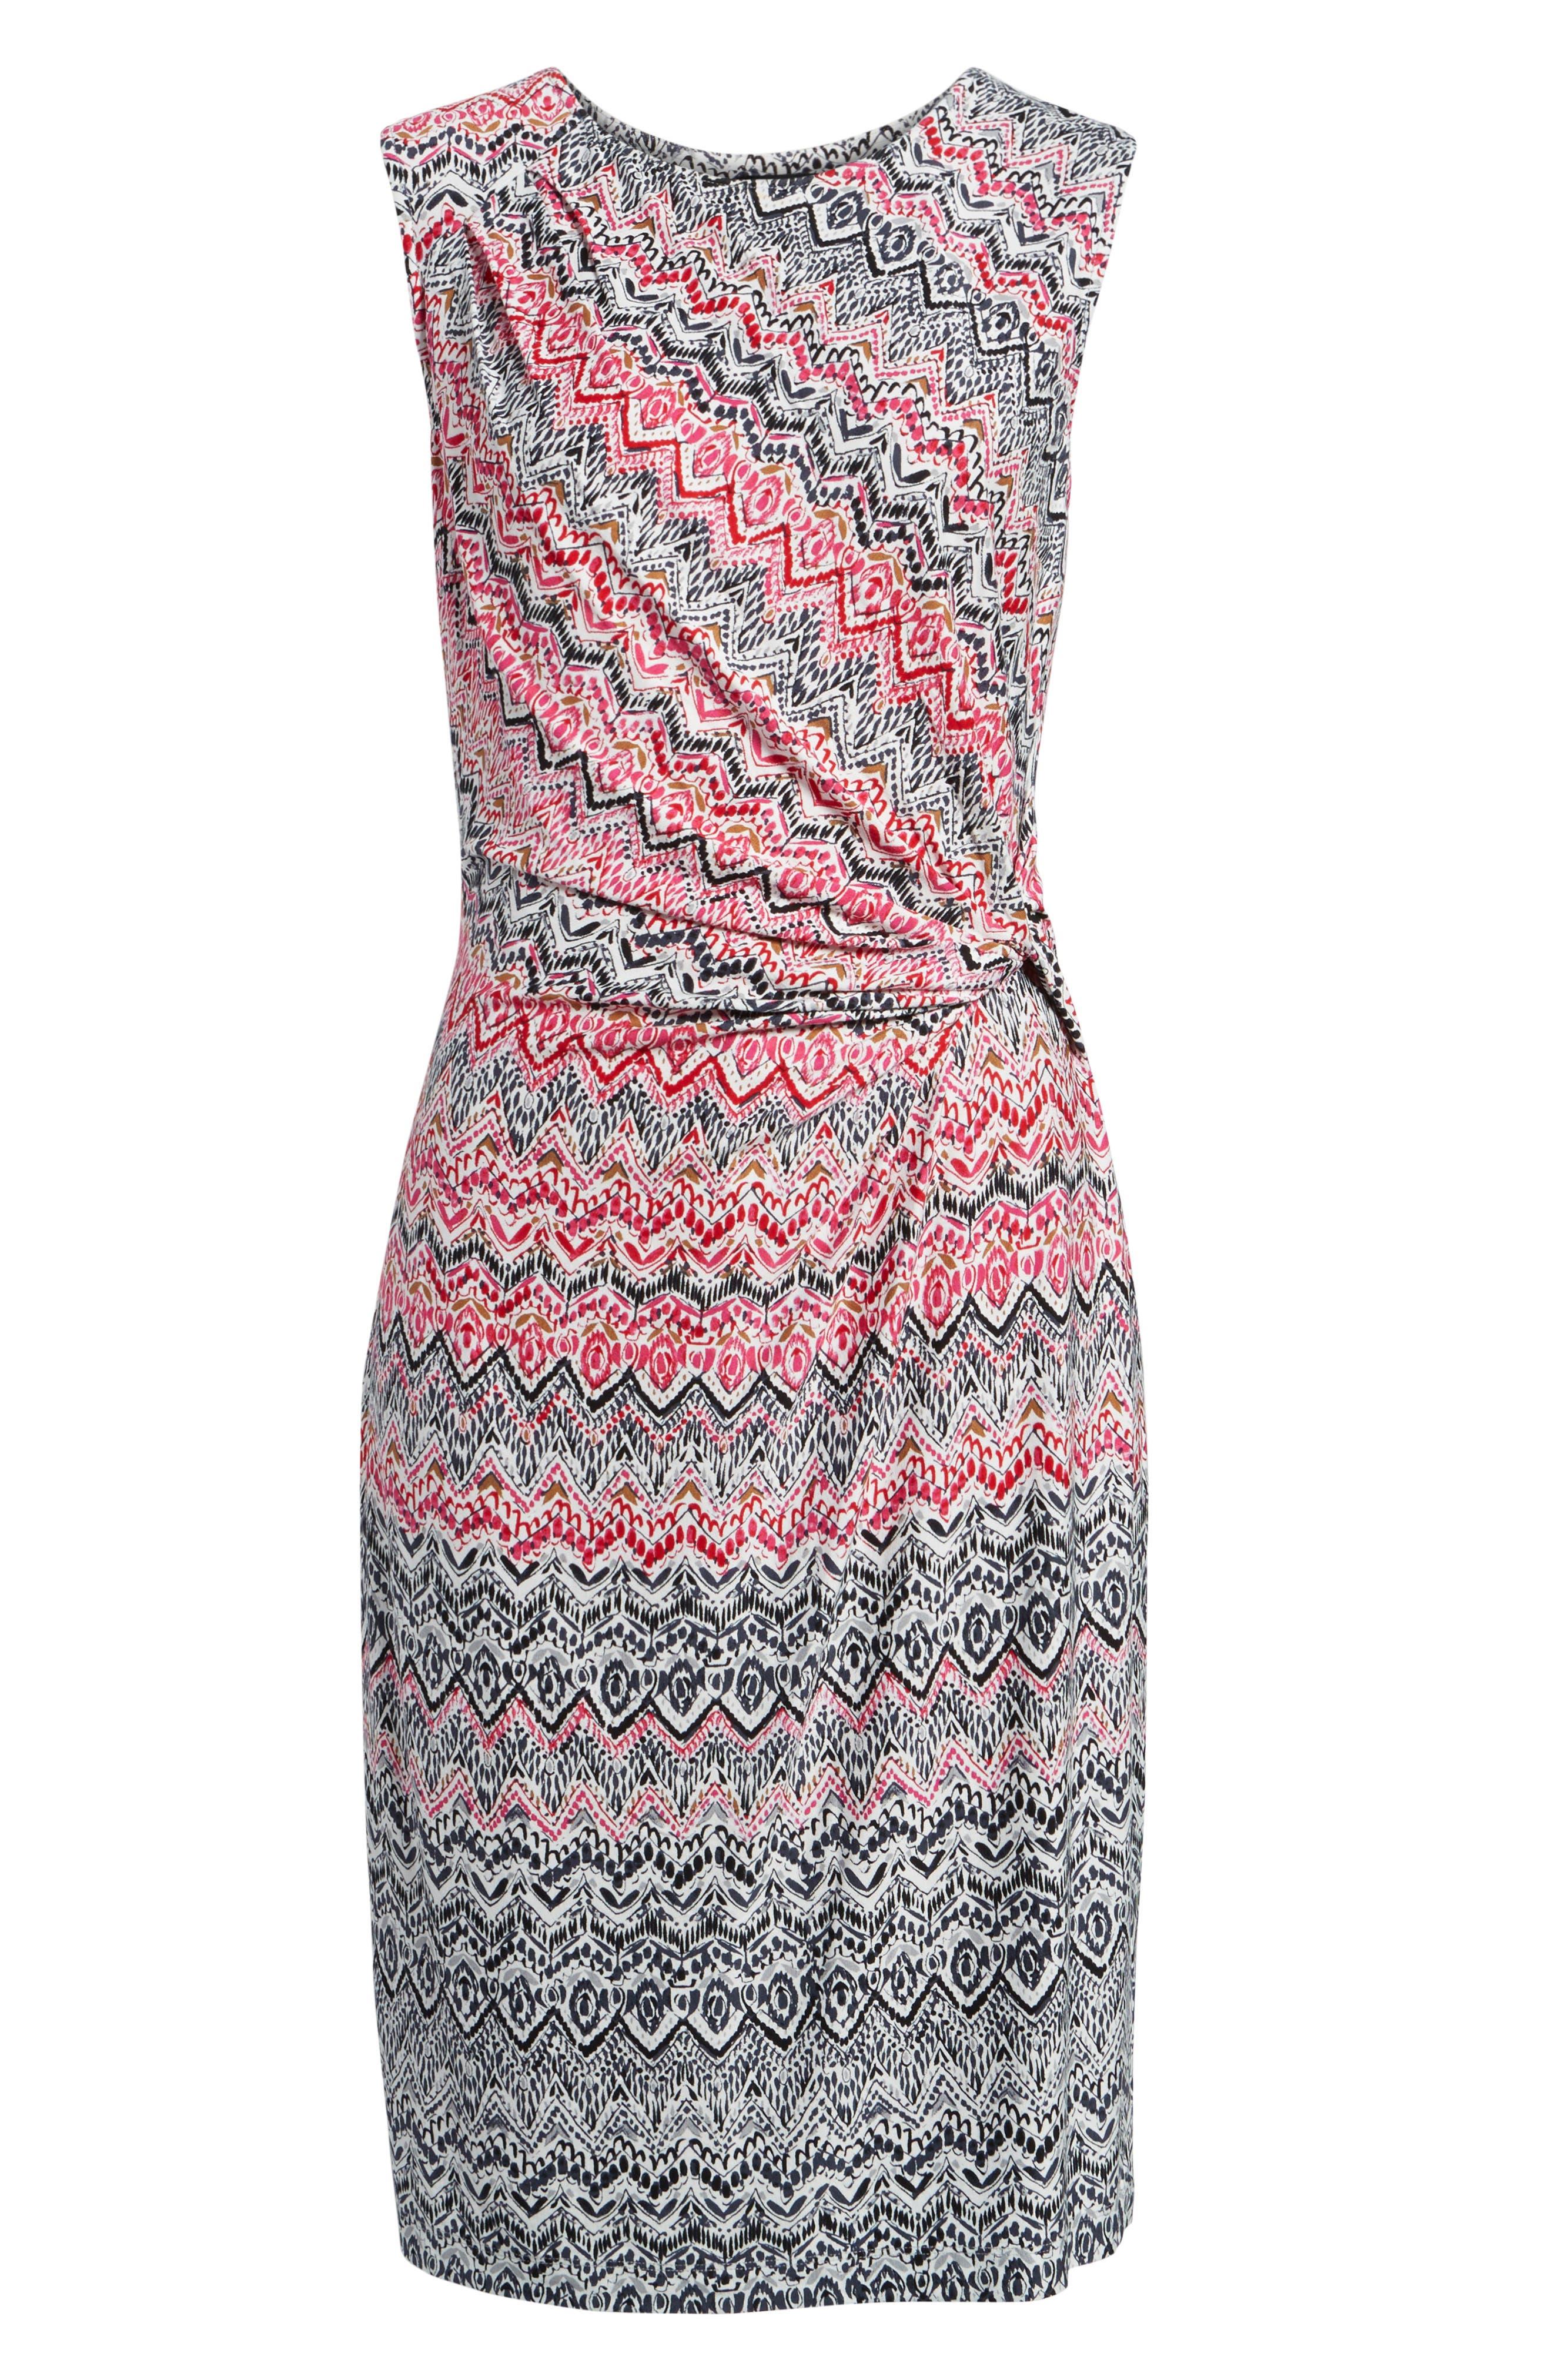 Spiced Up Twist Sheath Dress,                             Alternate thumbnail 6, color,                             690